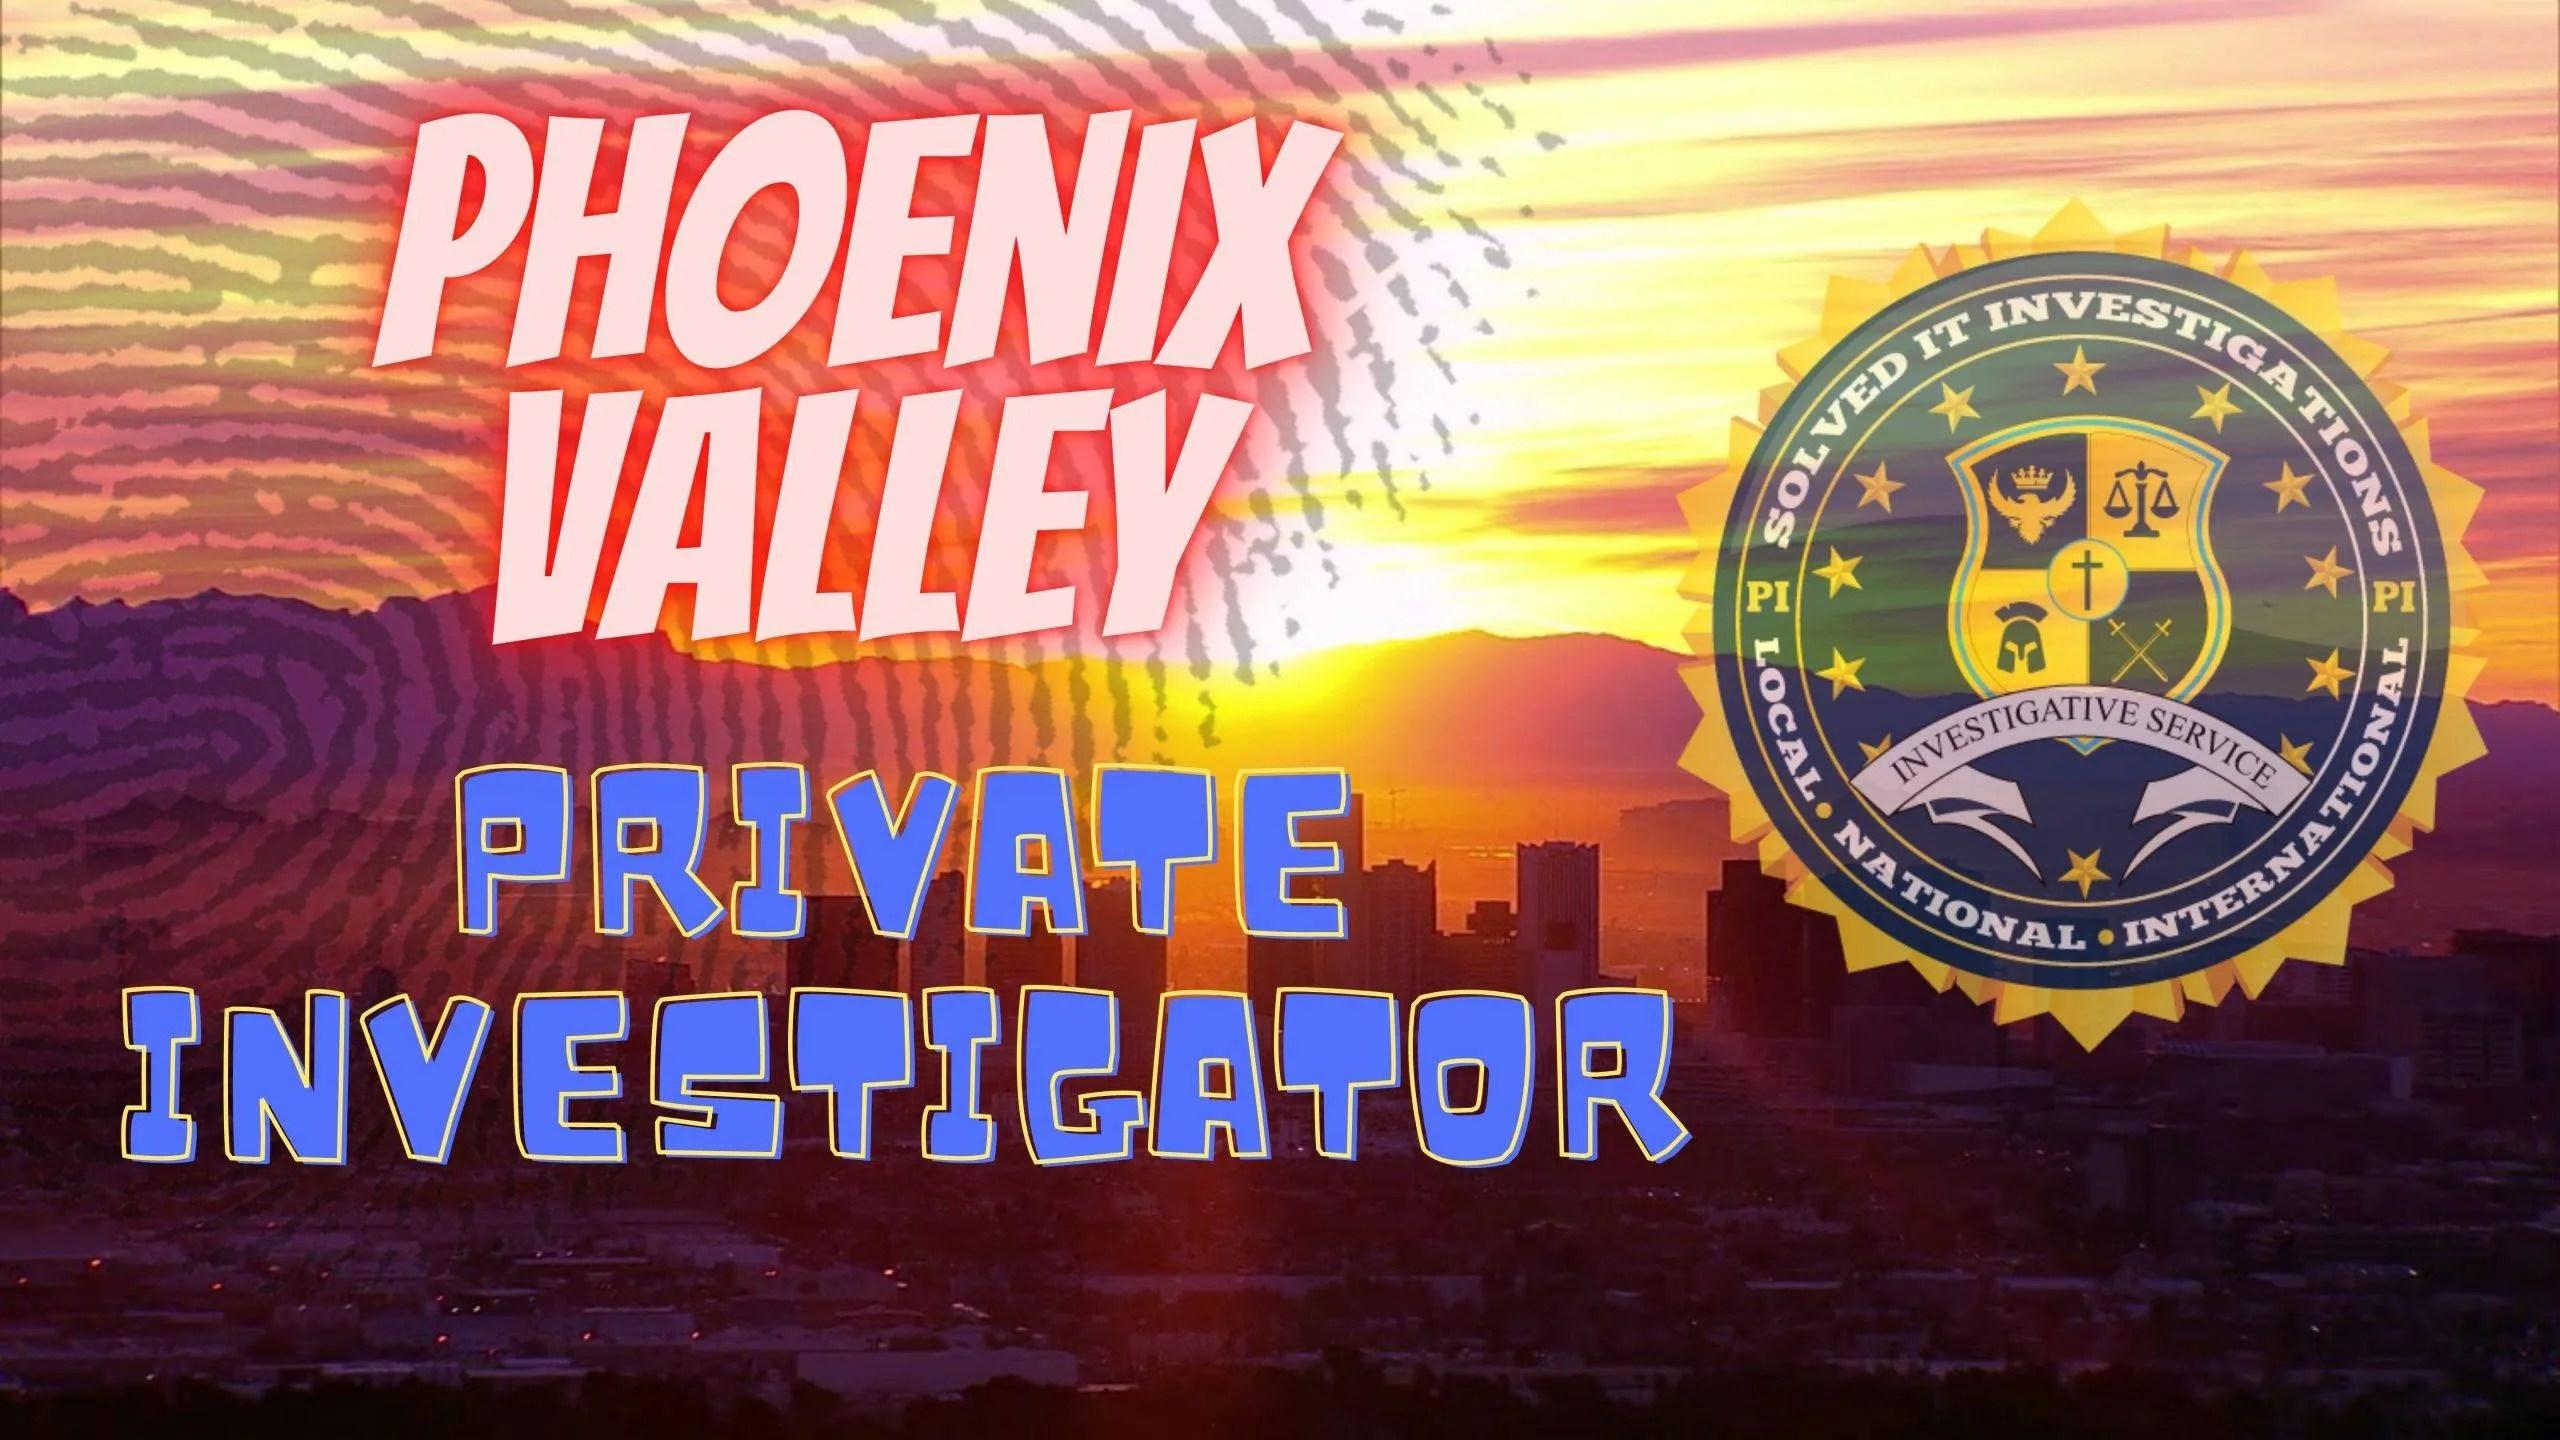 Phoenix Arizona Private Investigator